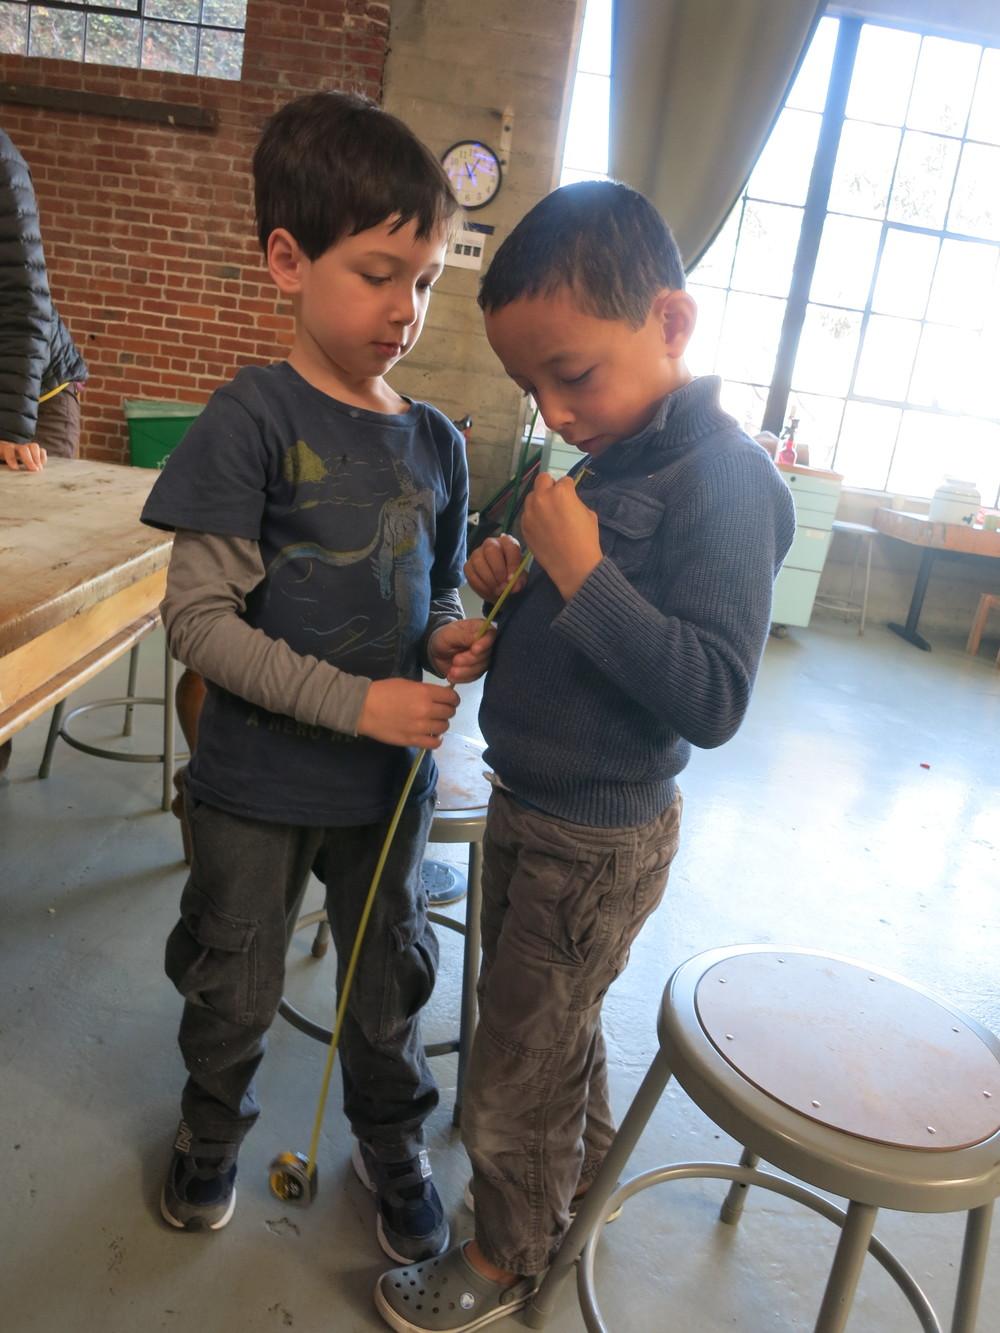 Ronan and Jayden get measurements during project design.